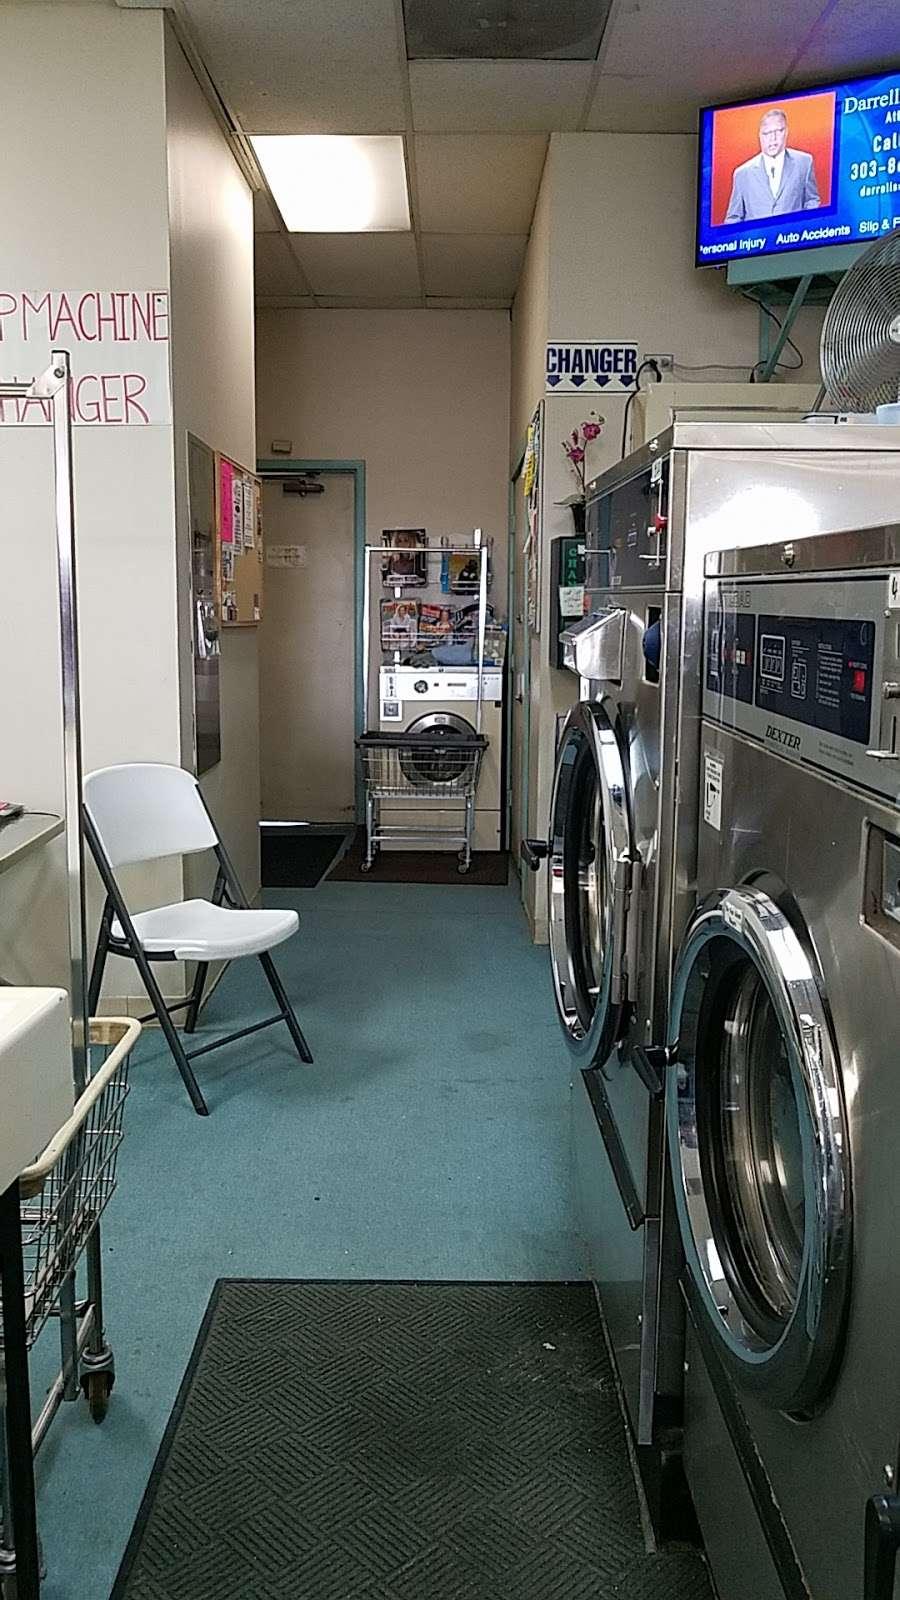 Andys Laundry - laundry  | Photo 1 of 4 | Address: 3871 E 120th Ave, Denver, CO 80233, USA | Phone: (303) 451-8454